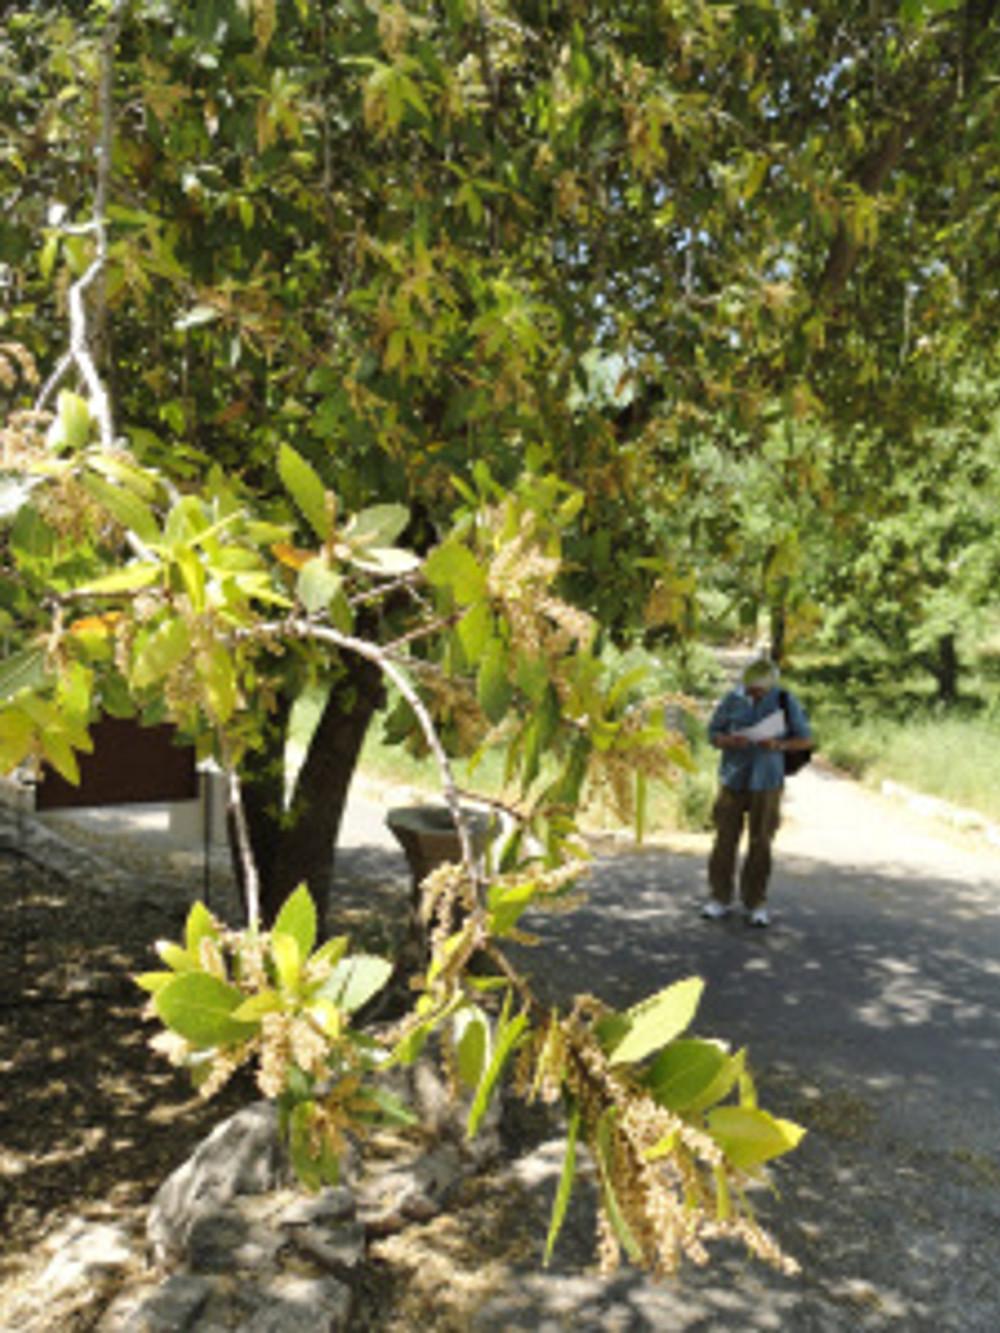 Quercus calliprinos with Bruce